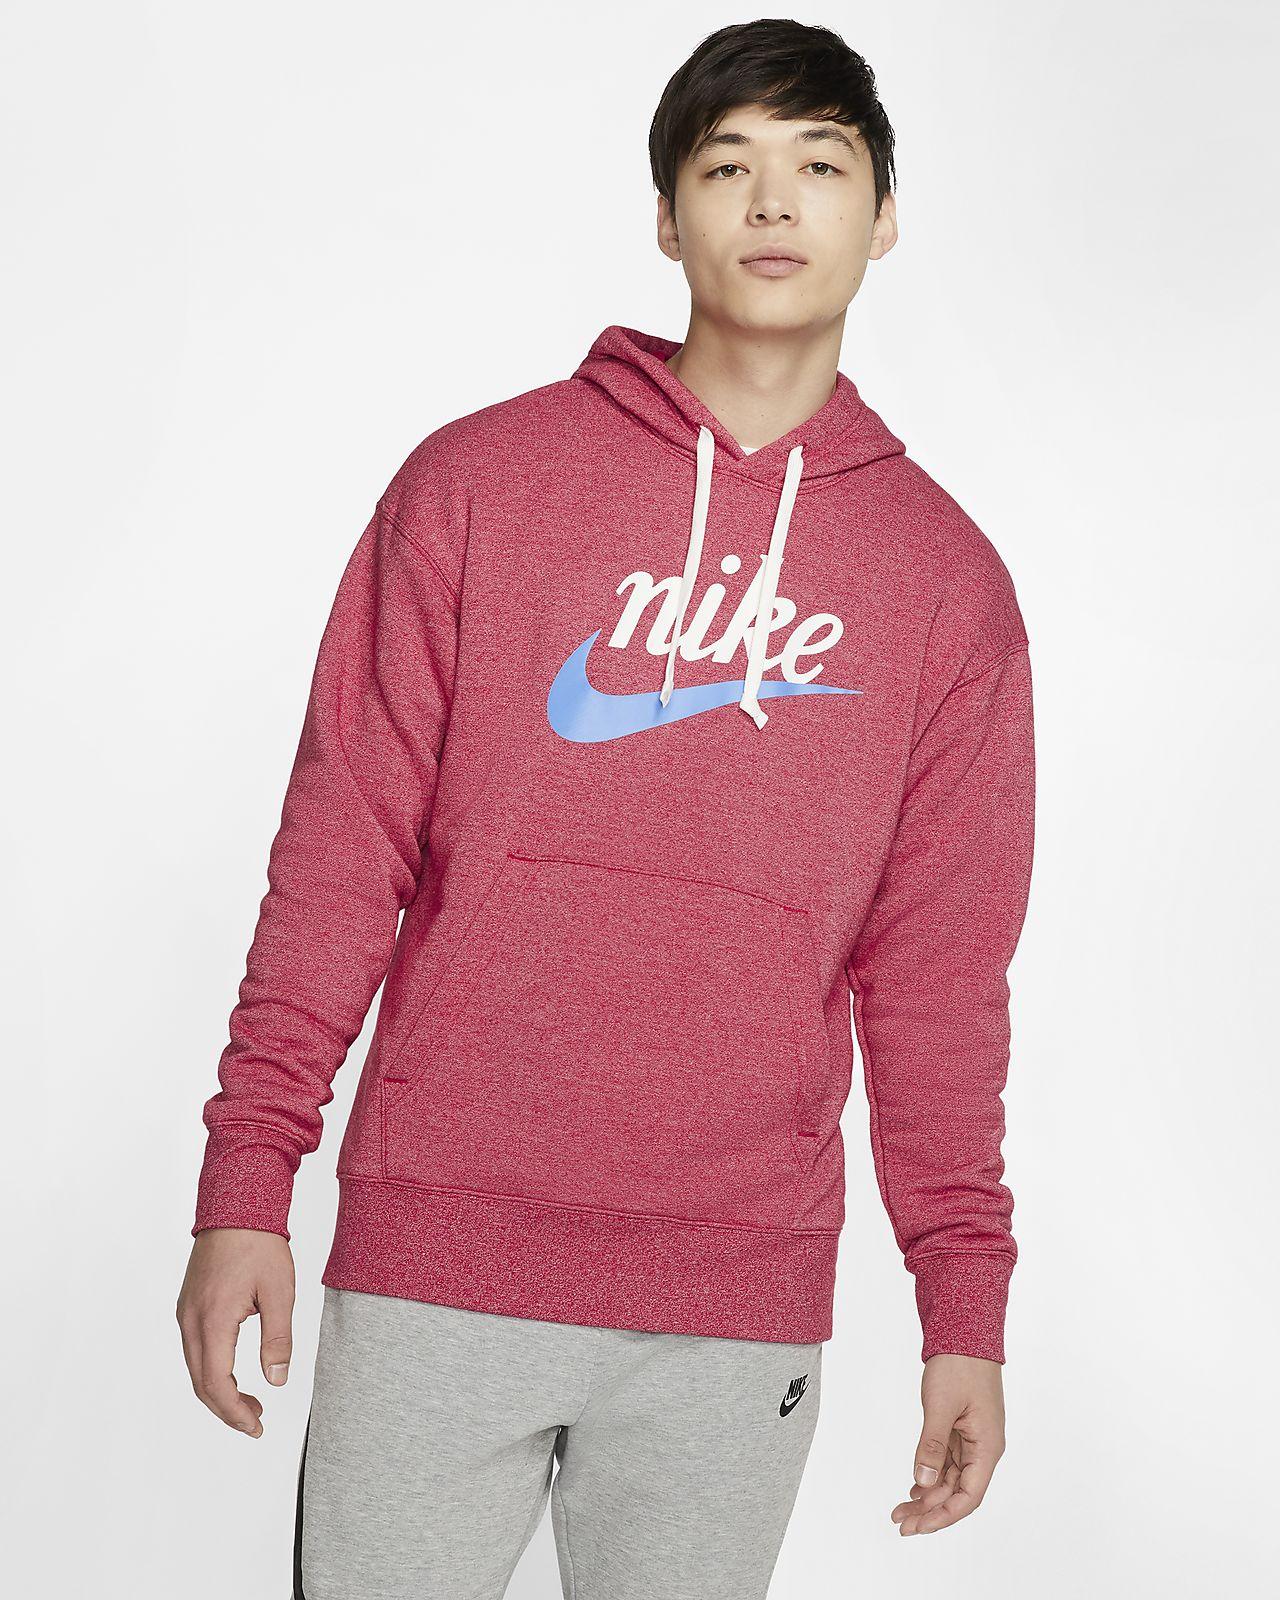 Nike Sportswear Heritage Men's Graphic Pullover Hoodie